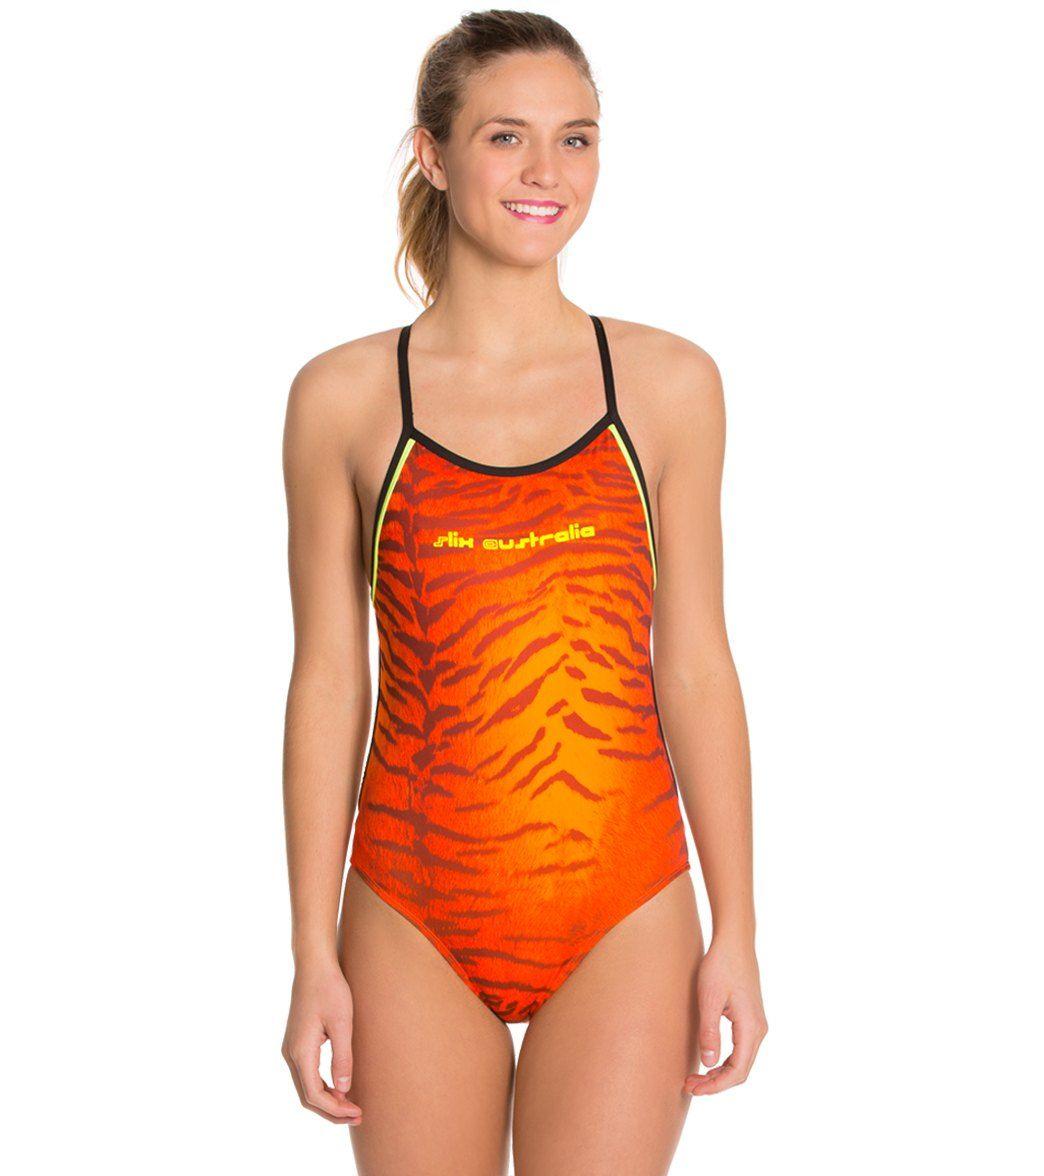 1d17a62f38b1d8 Slix Australia Tigger Minx Women's One Piece Swimsuit at SwimOutlet.com -  Free Shipping Women's